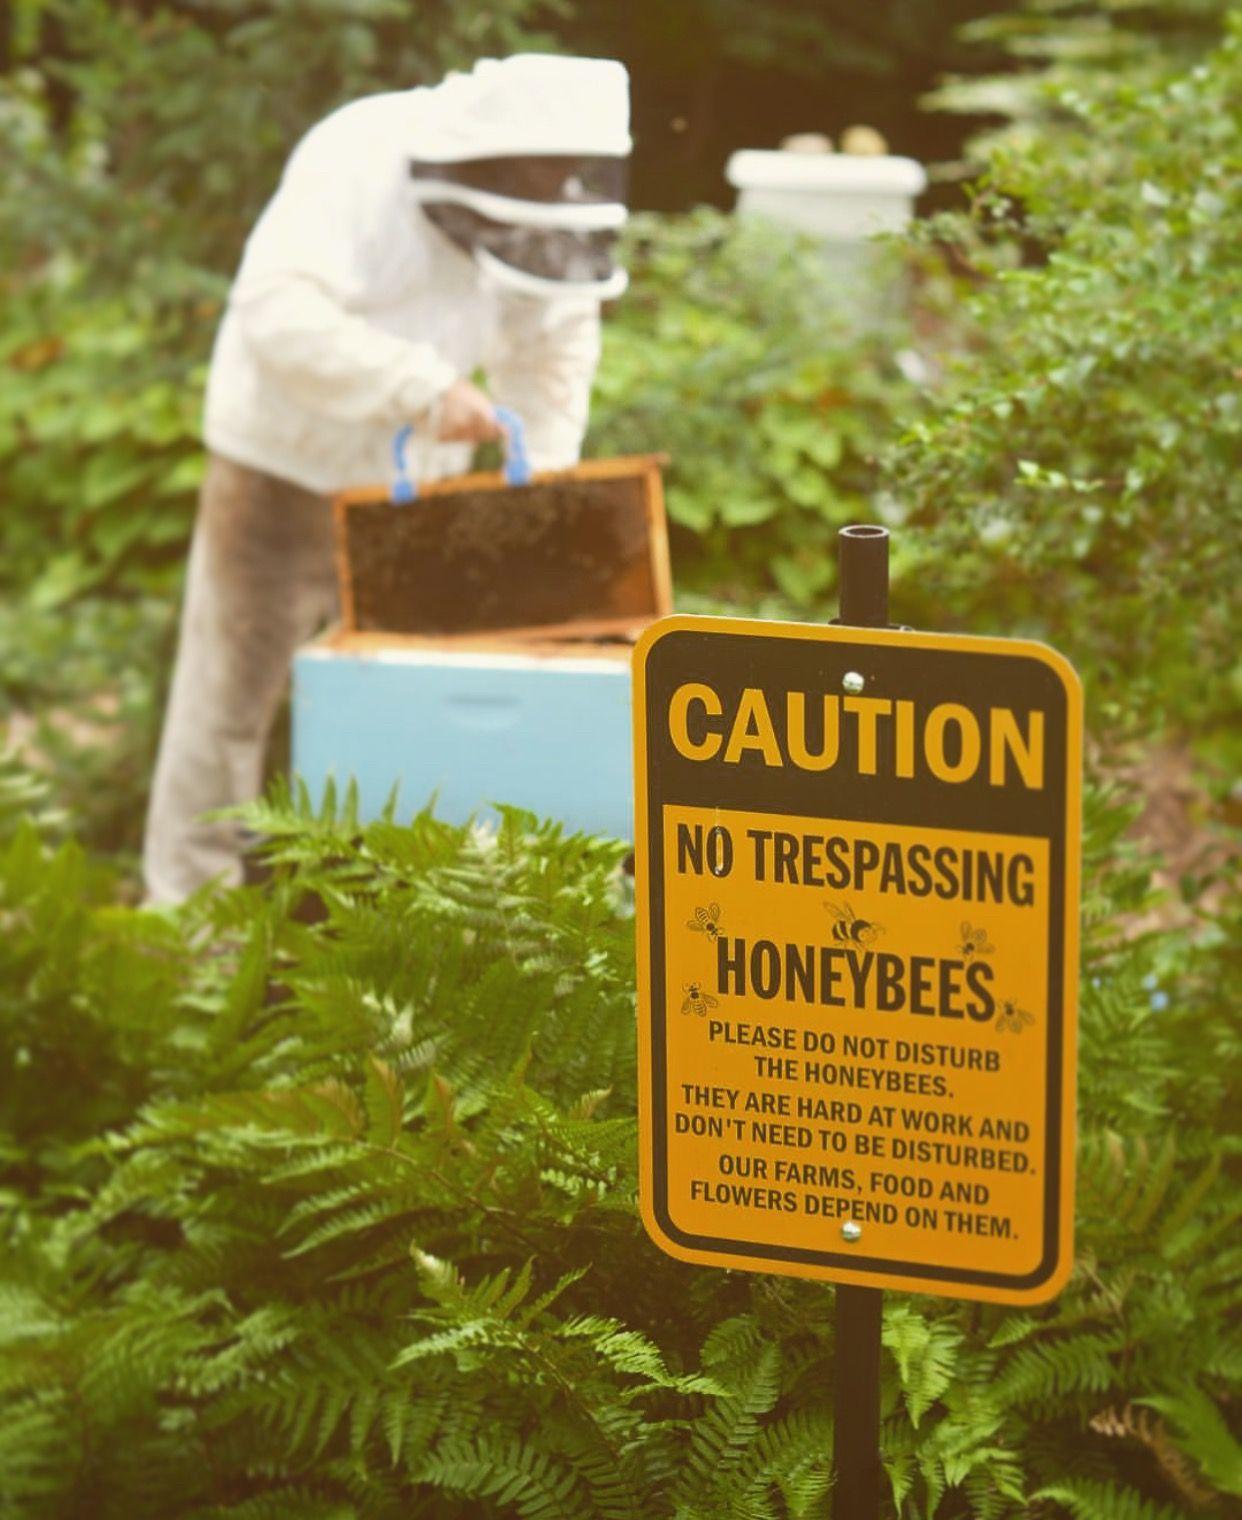 Beekeeper & honeybees hard at work! Do not disturb